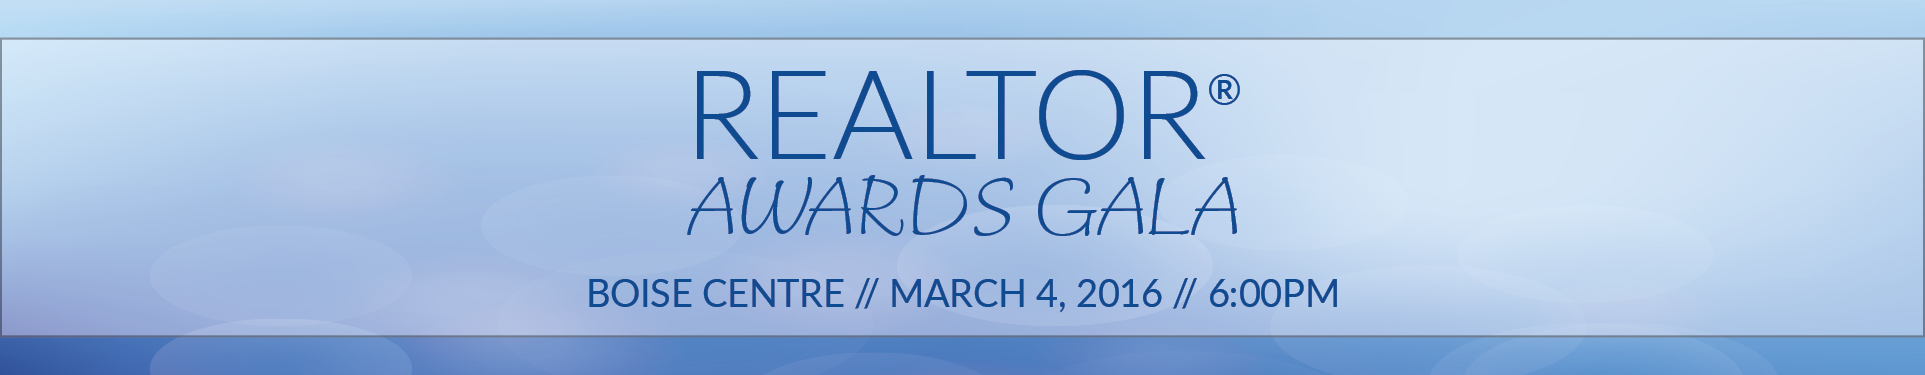 REALTOR® Awards Gala